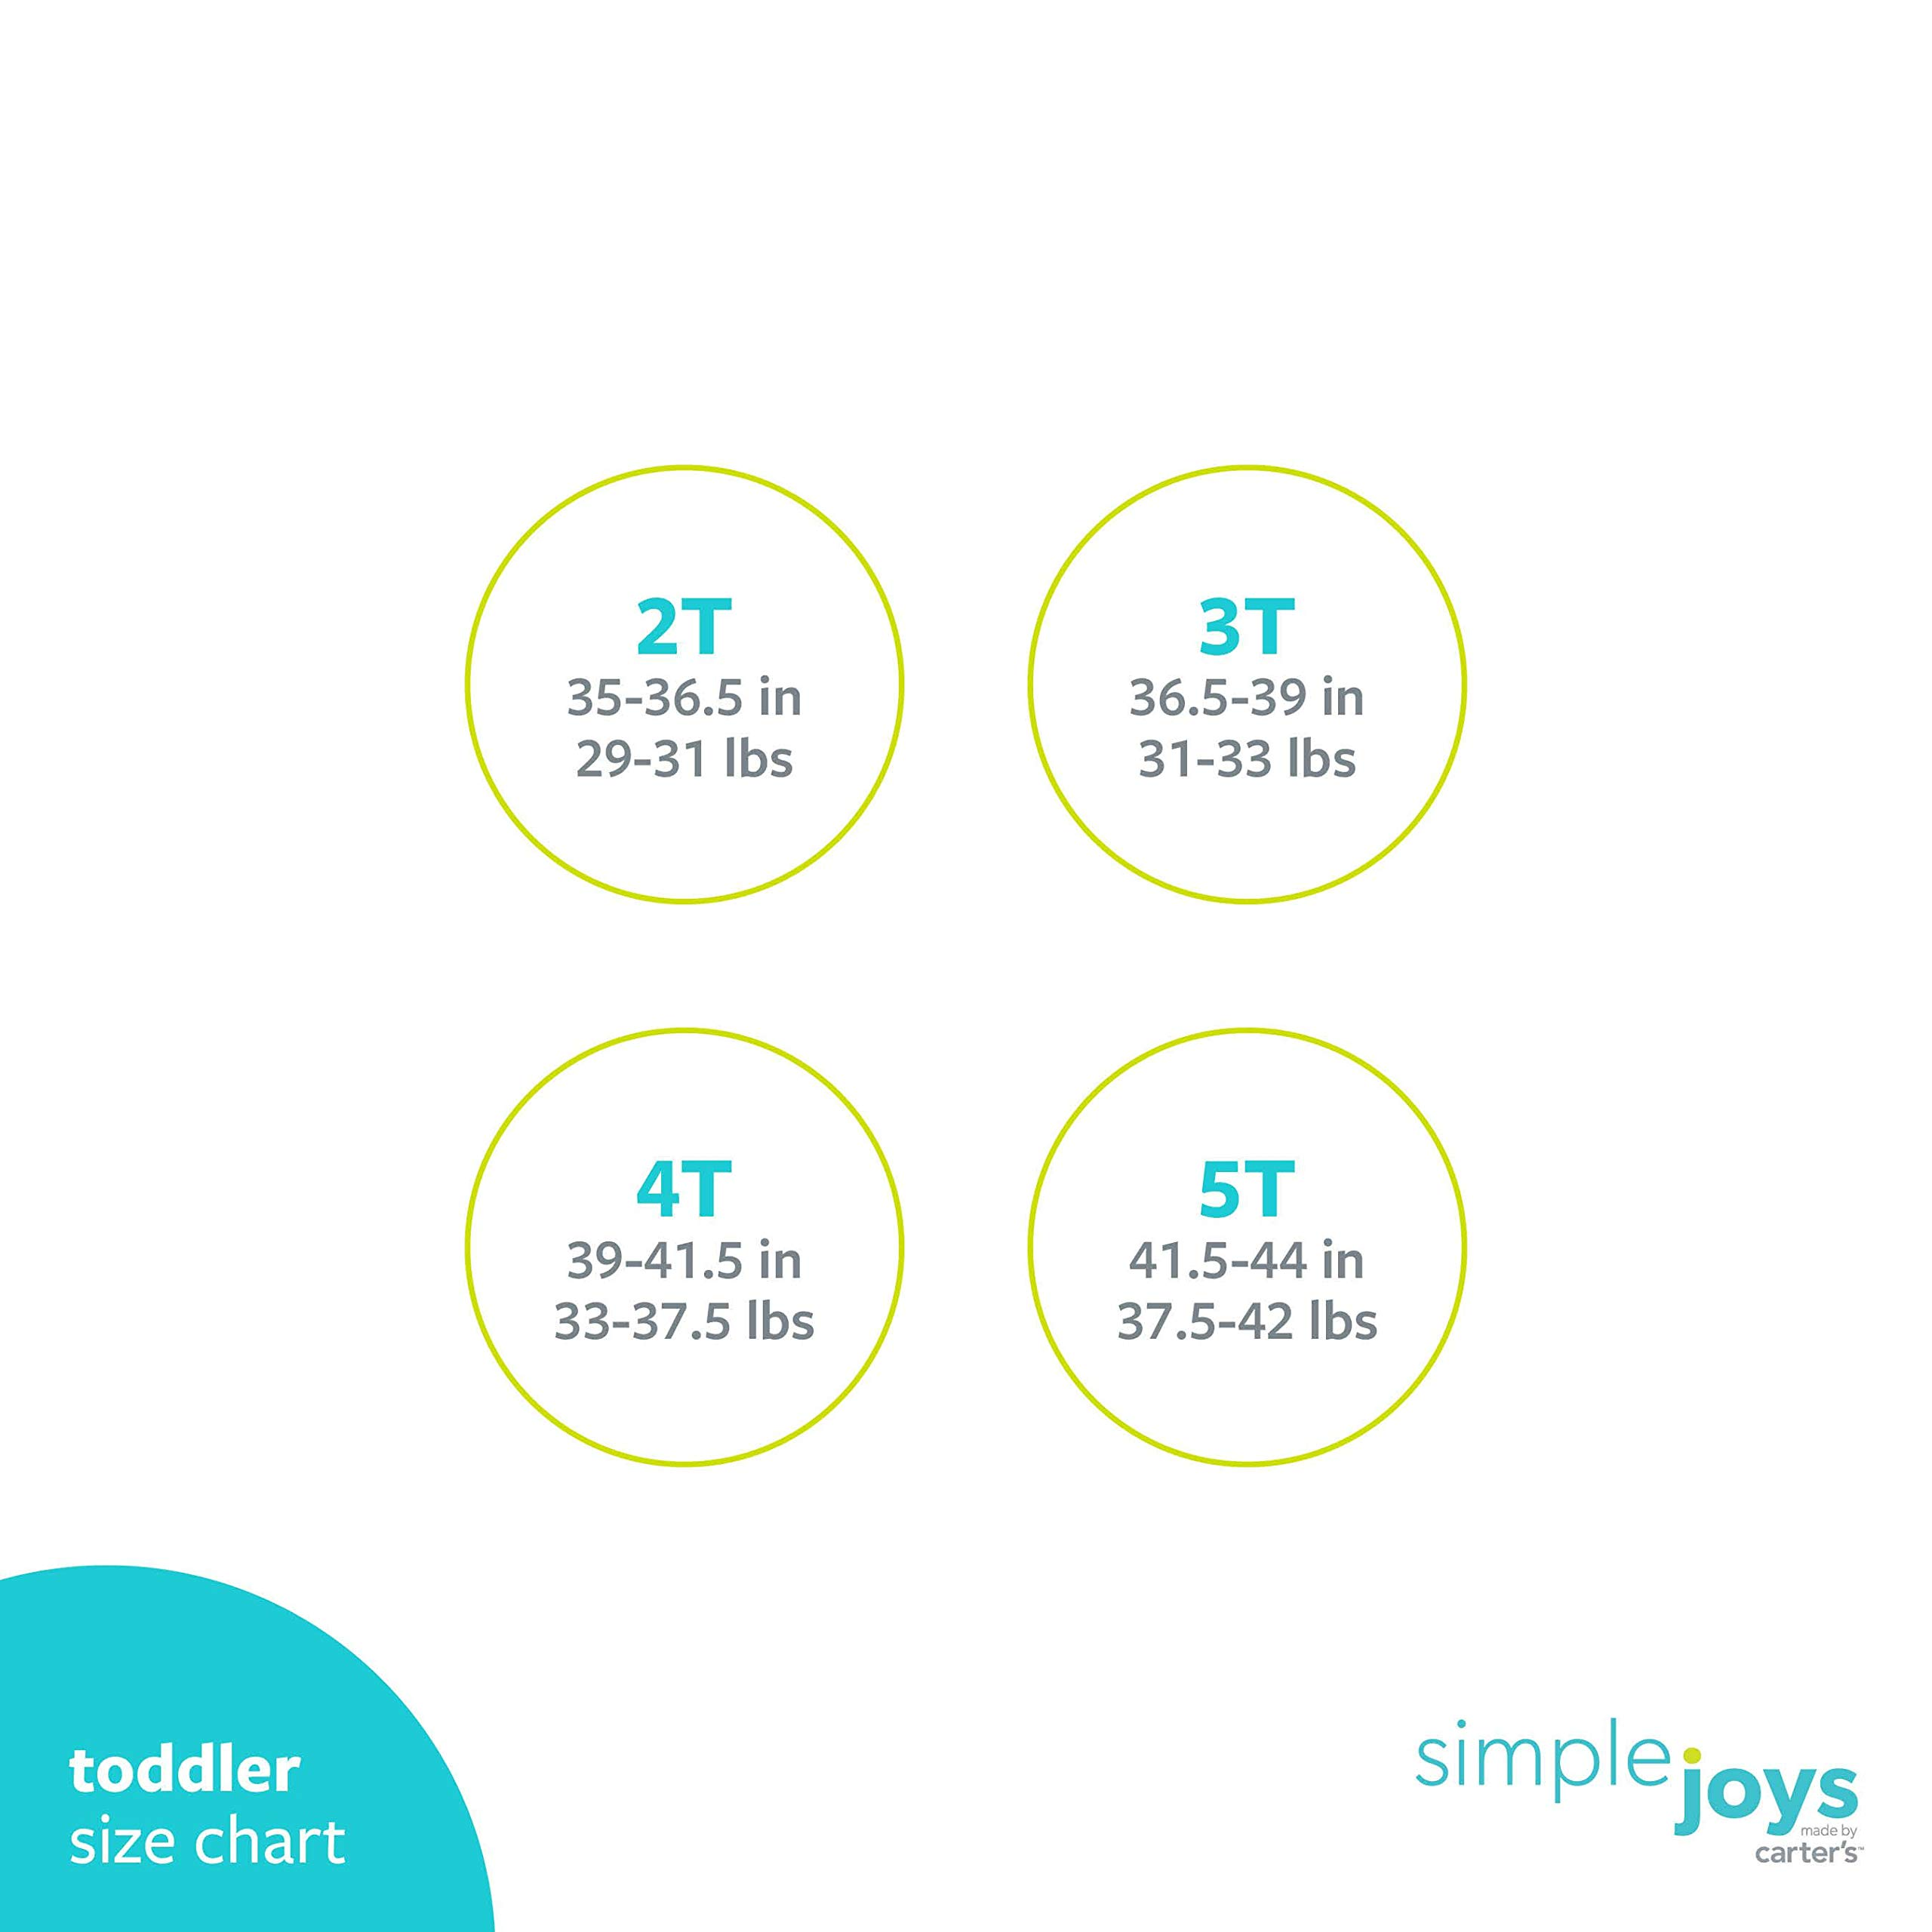 Simple Joys by Carter's Toddler Girls' 4-Piece Short-Sleeve Dress, Top, and Pants Playwear Set